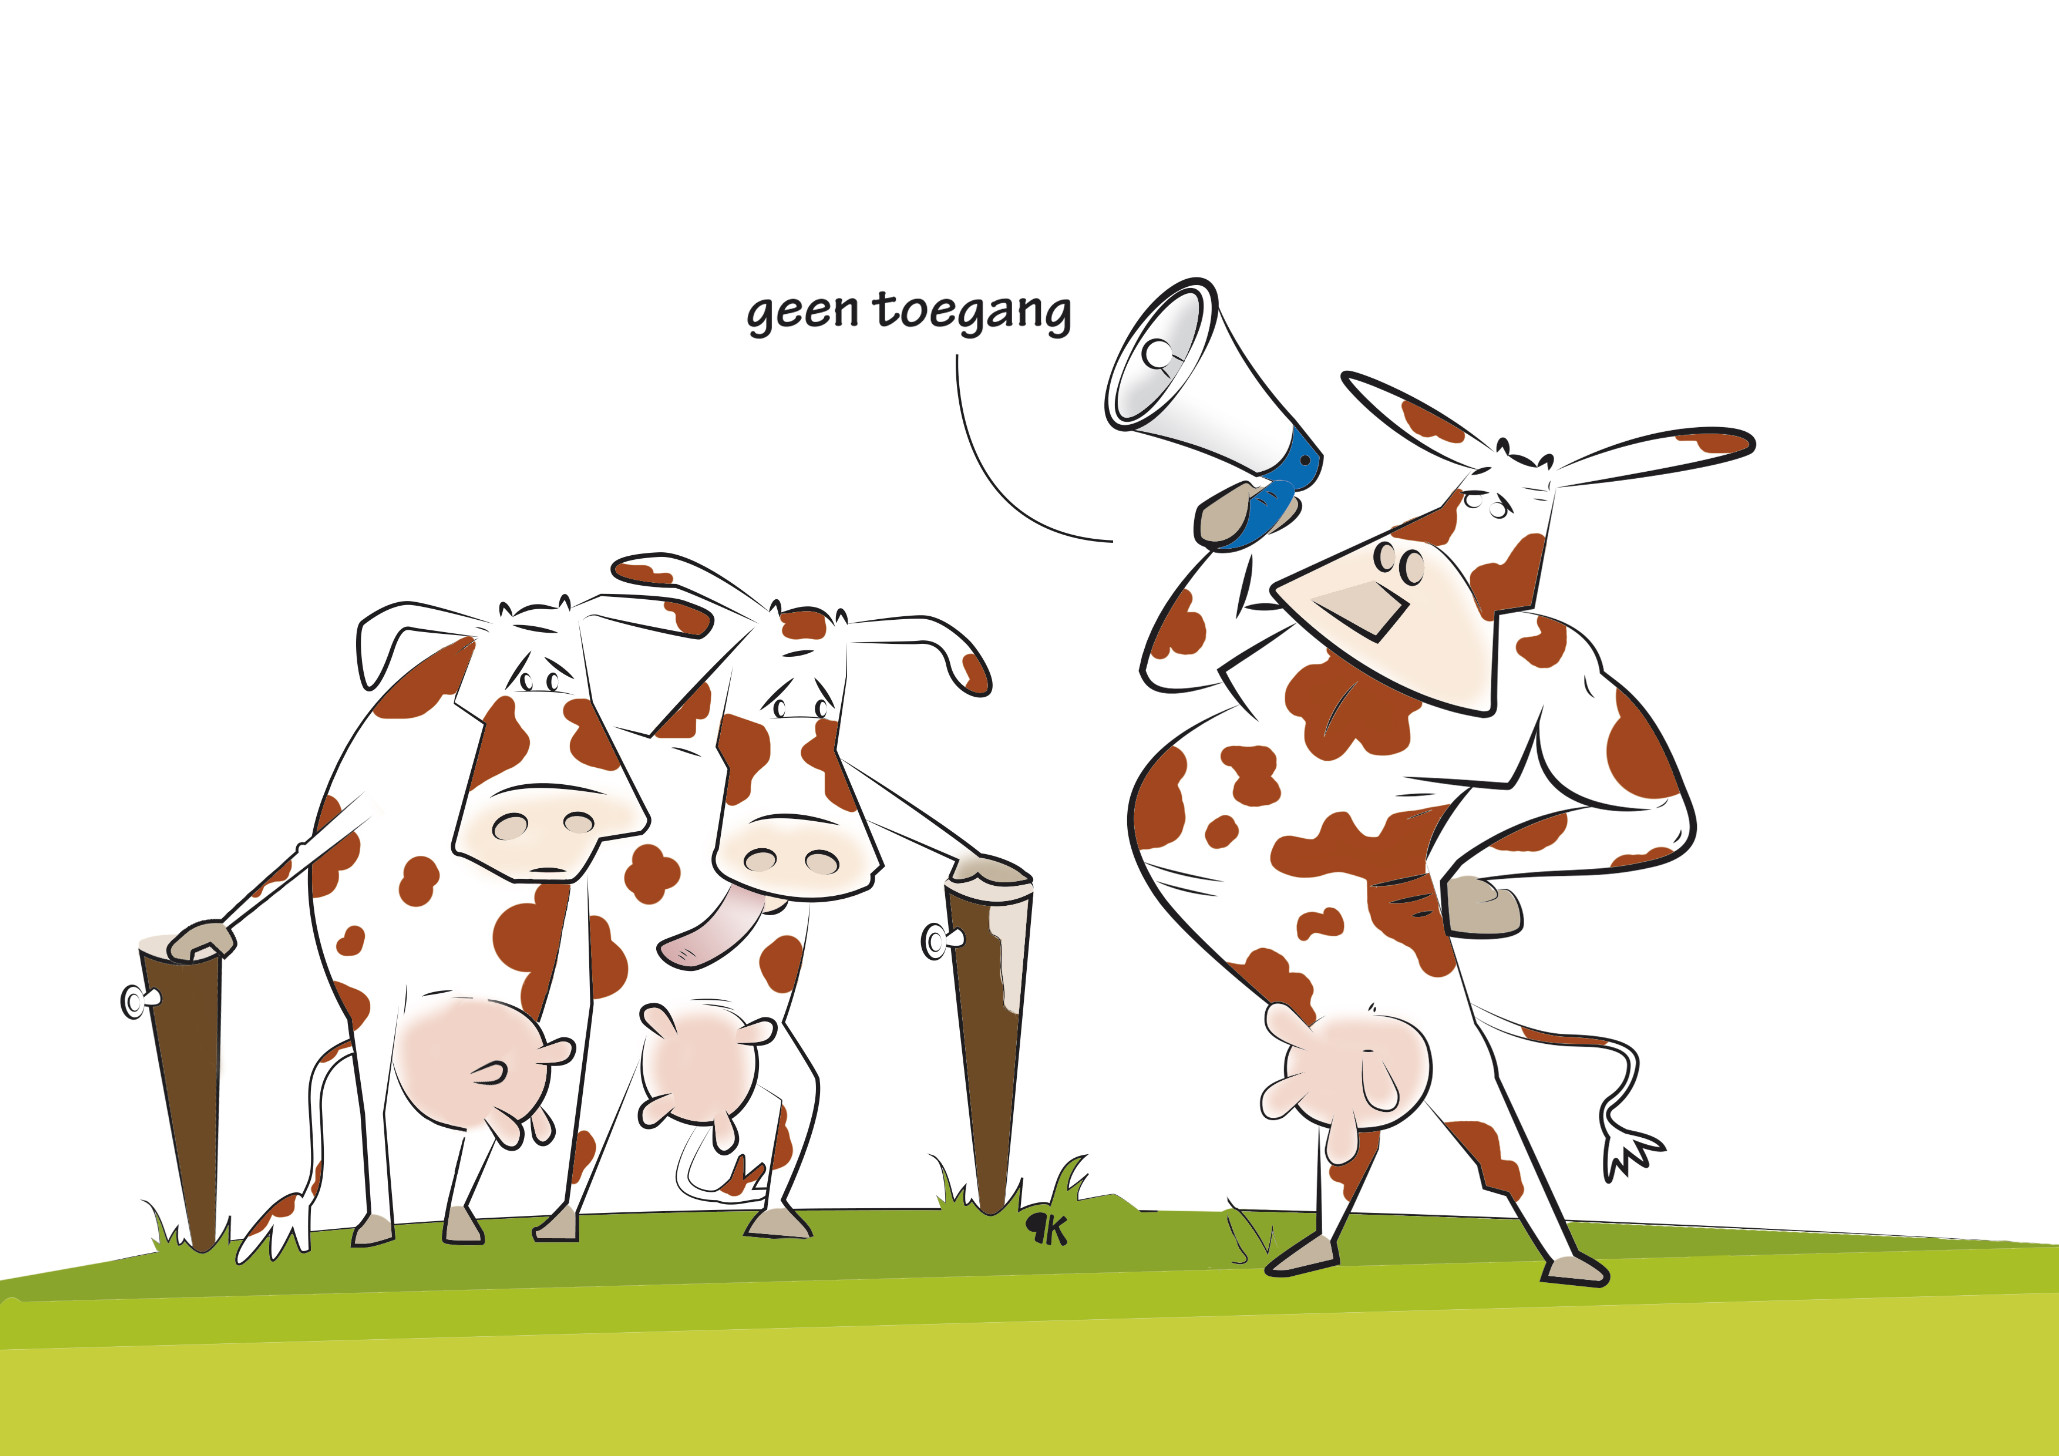 App vindt nauwkeurig locatie van individuele koeien